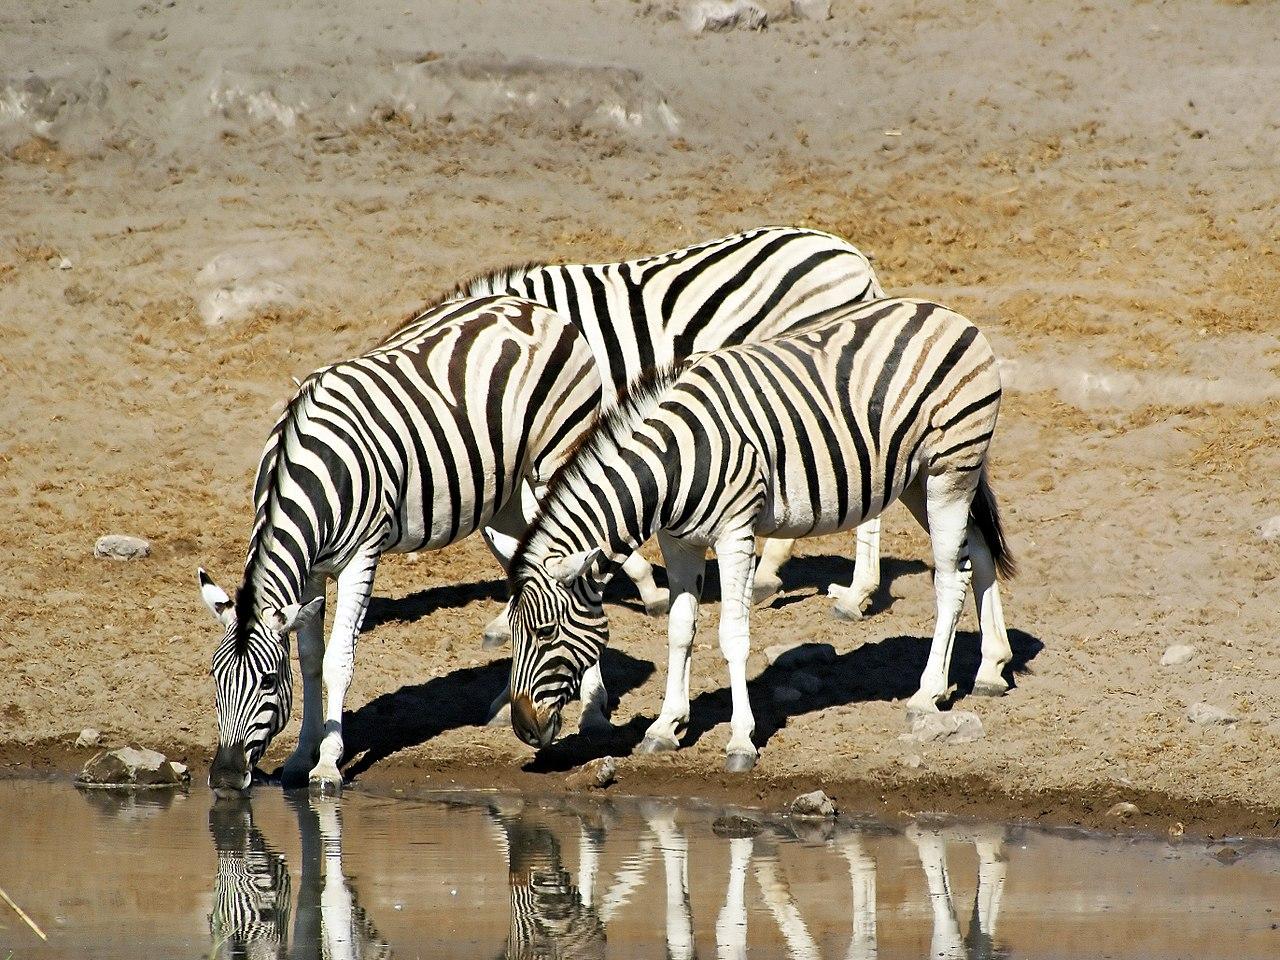 namibia, zebras